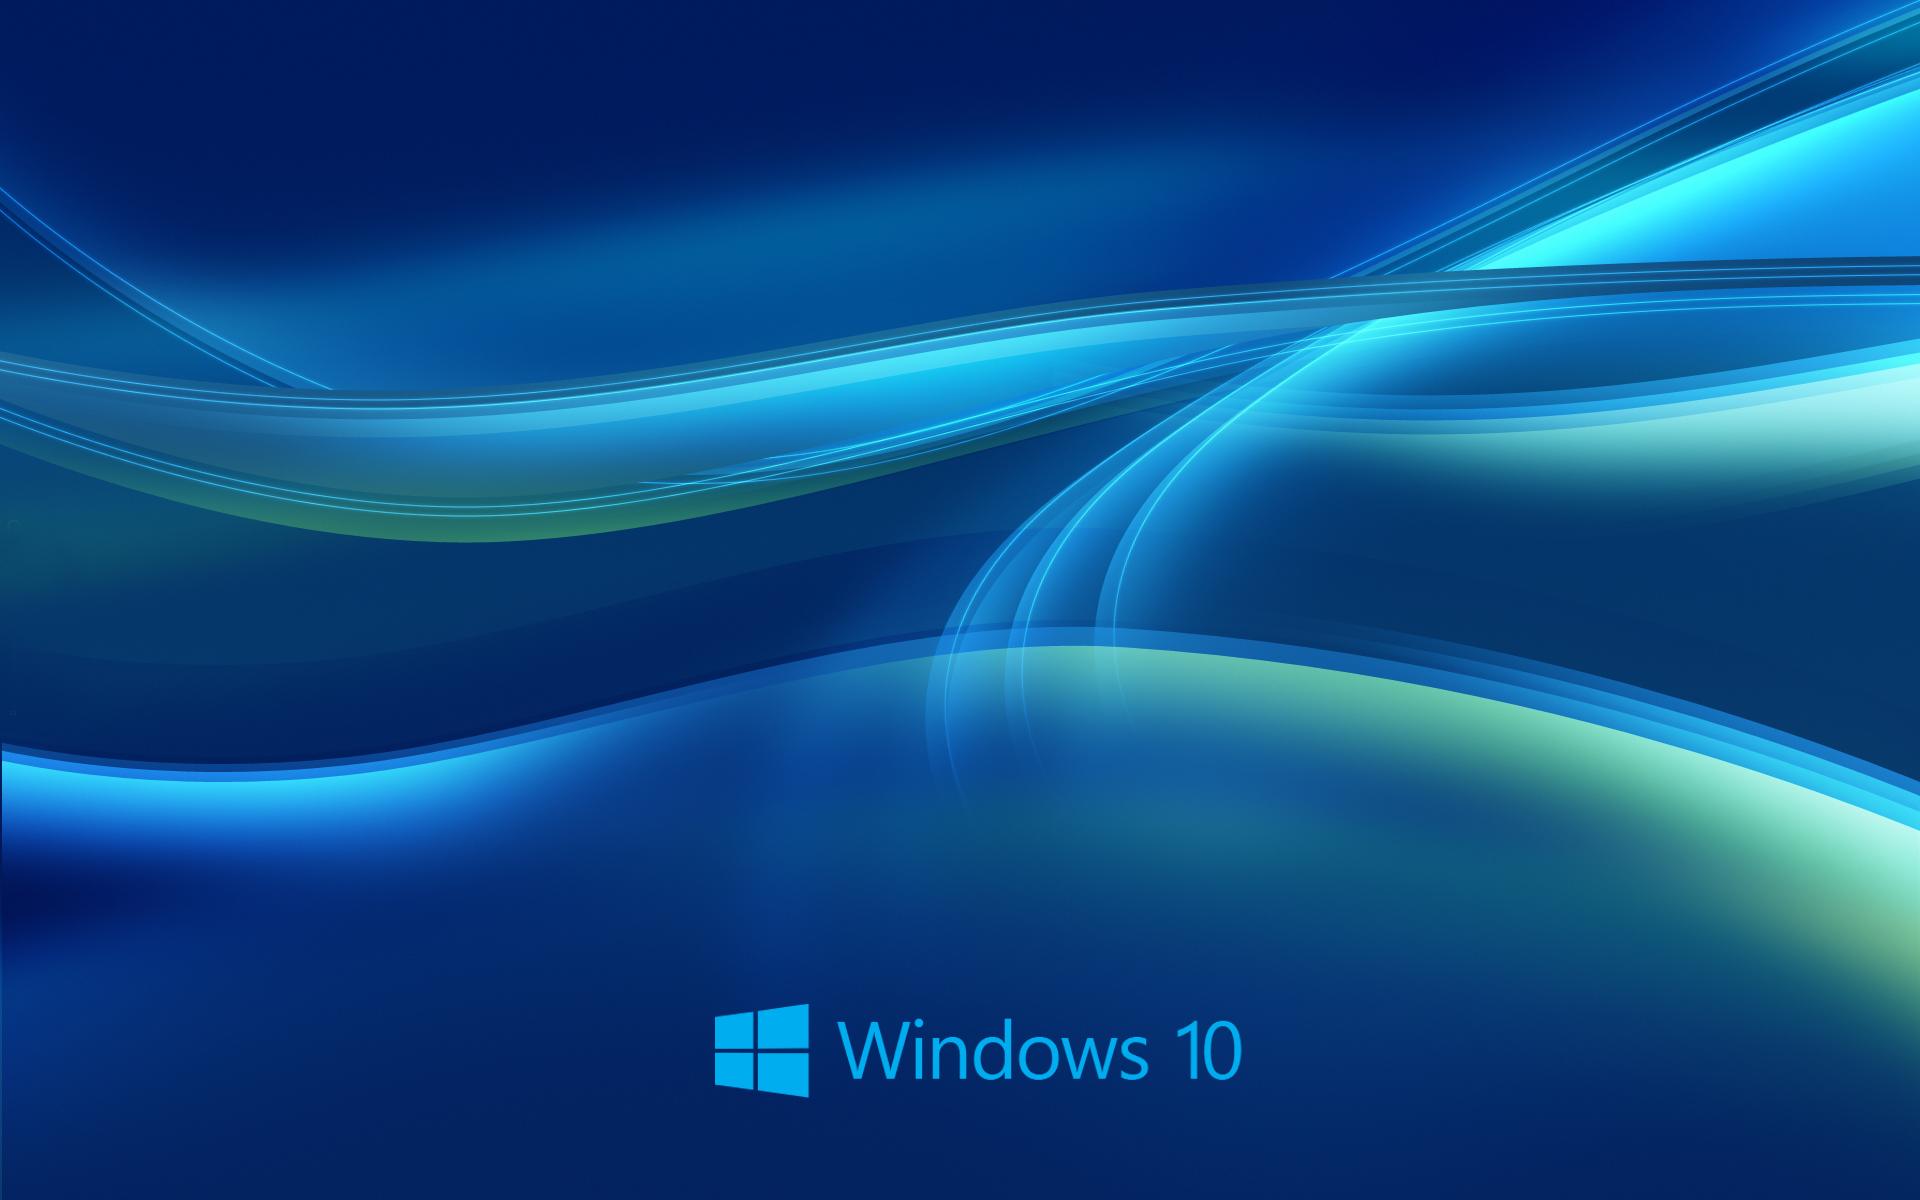 Hd desktop wallpapers windows 10 wallpapersafari - Hd wallpapers for pc windows ...